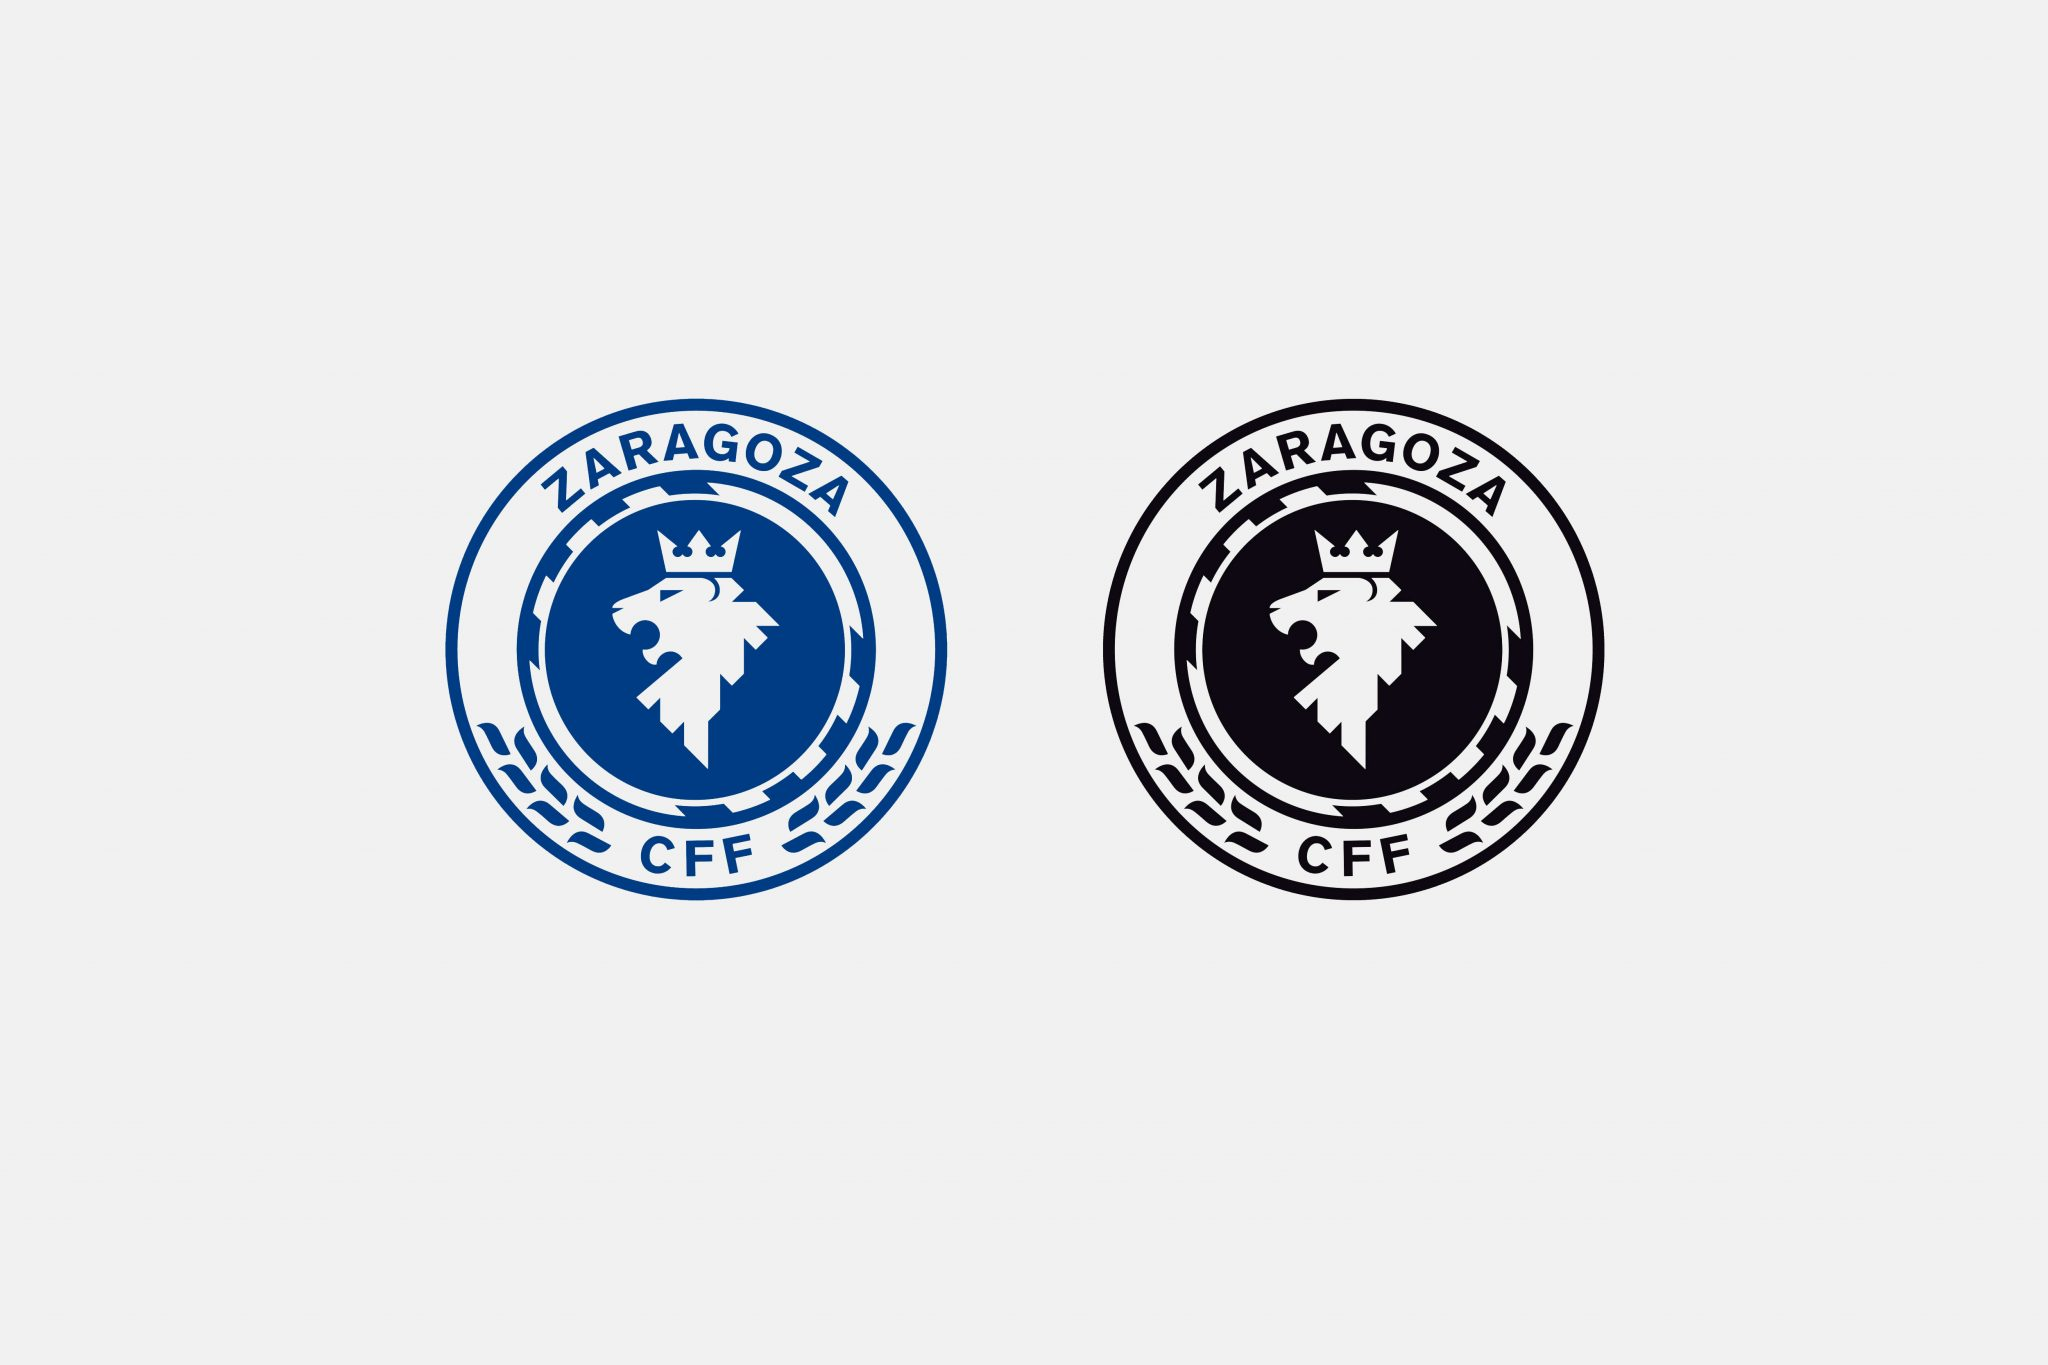 Variants disseny Zaragoza CFF